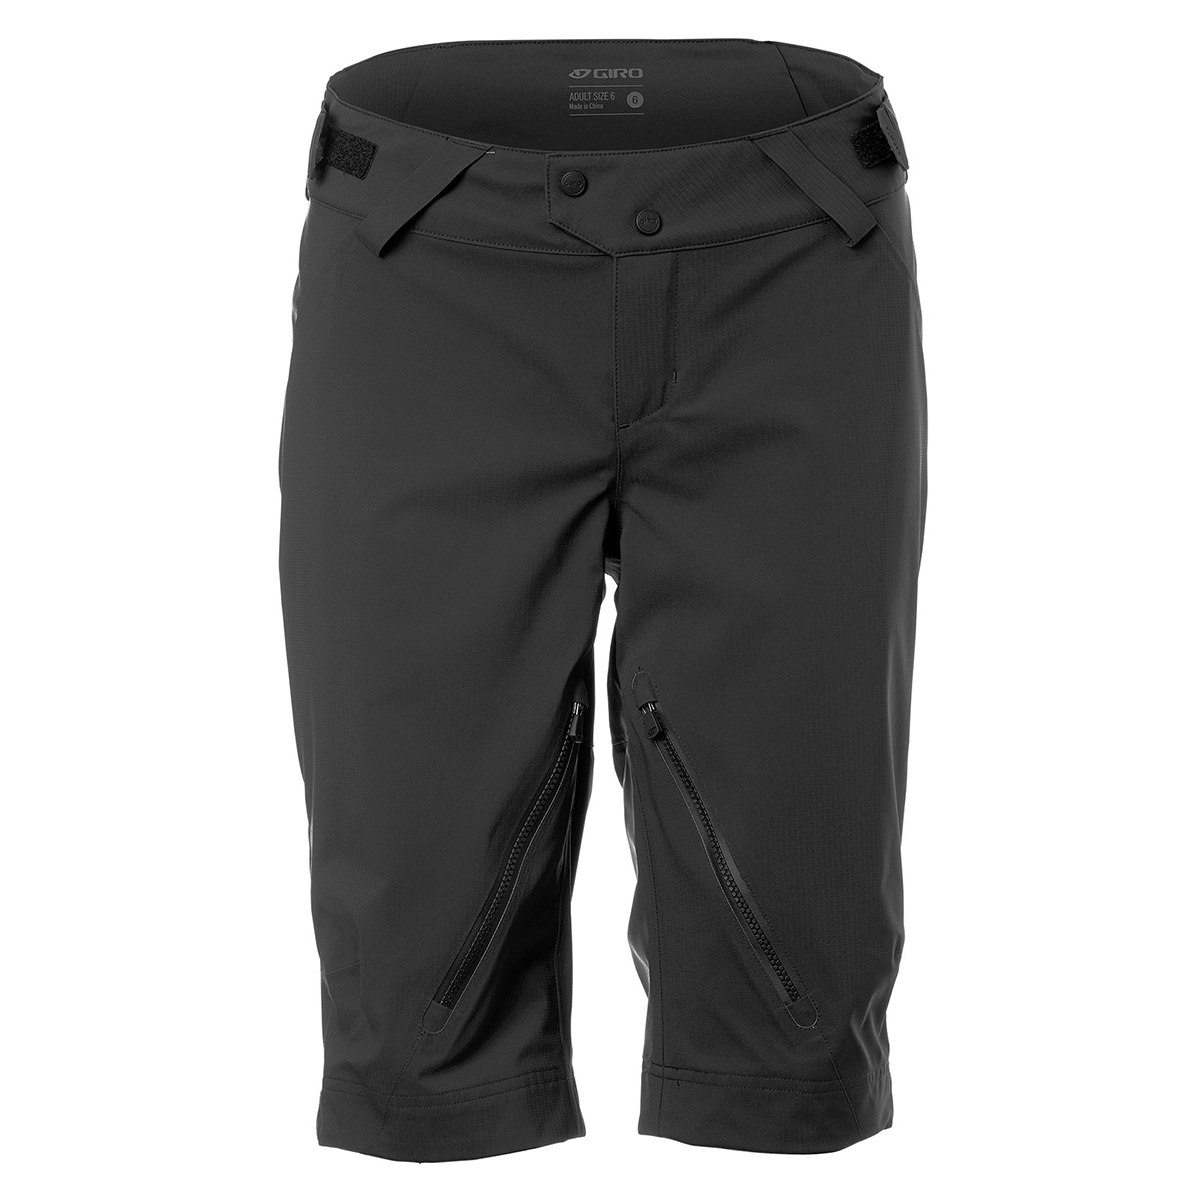 Giro Havoc H2O Women's Short - Black